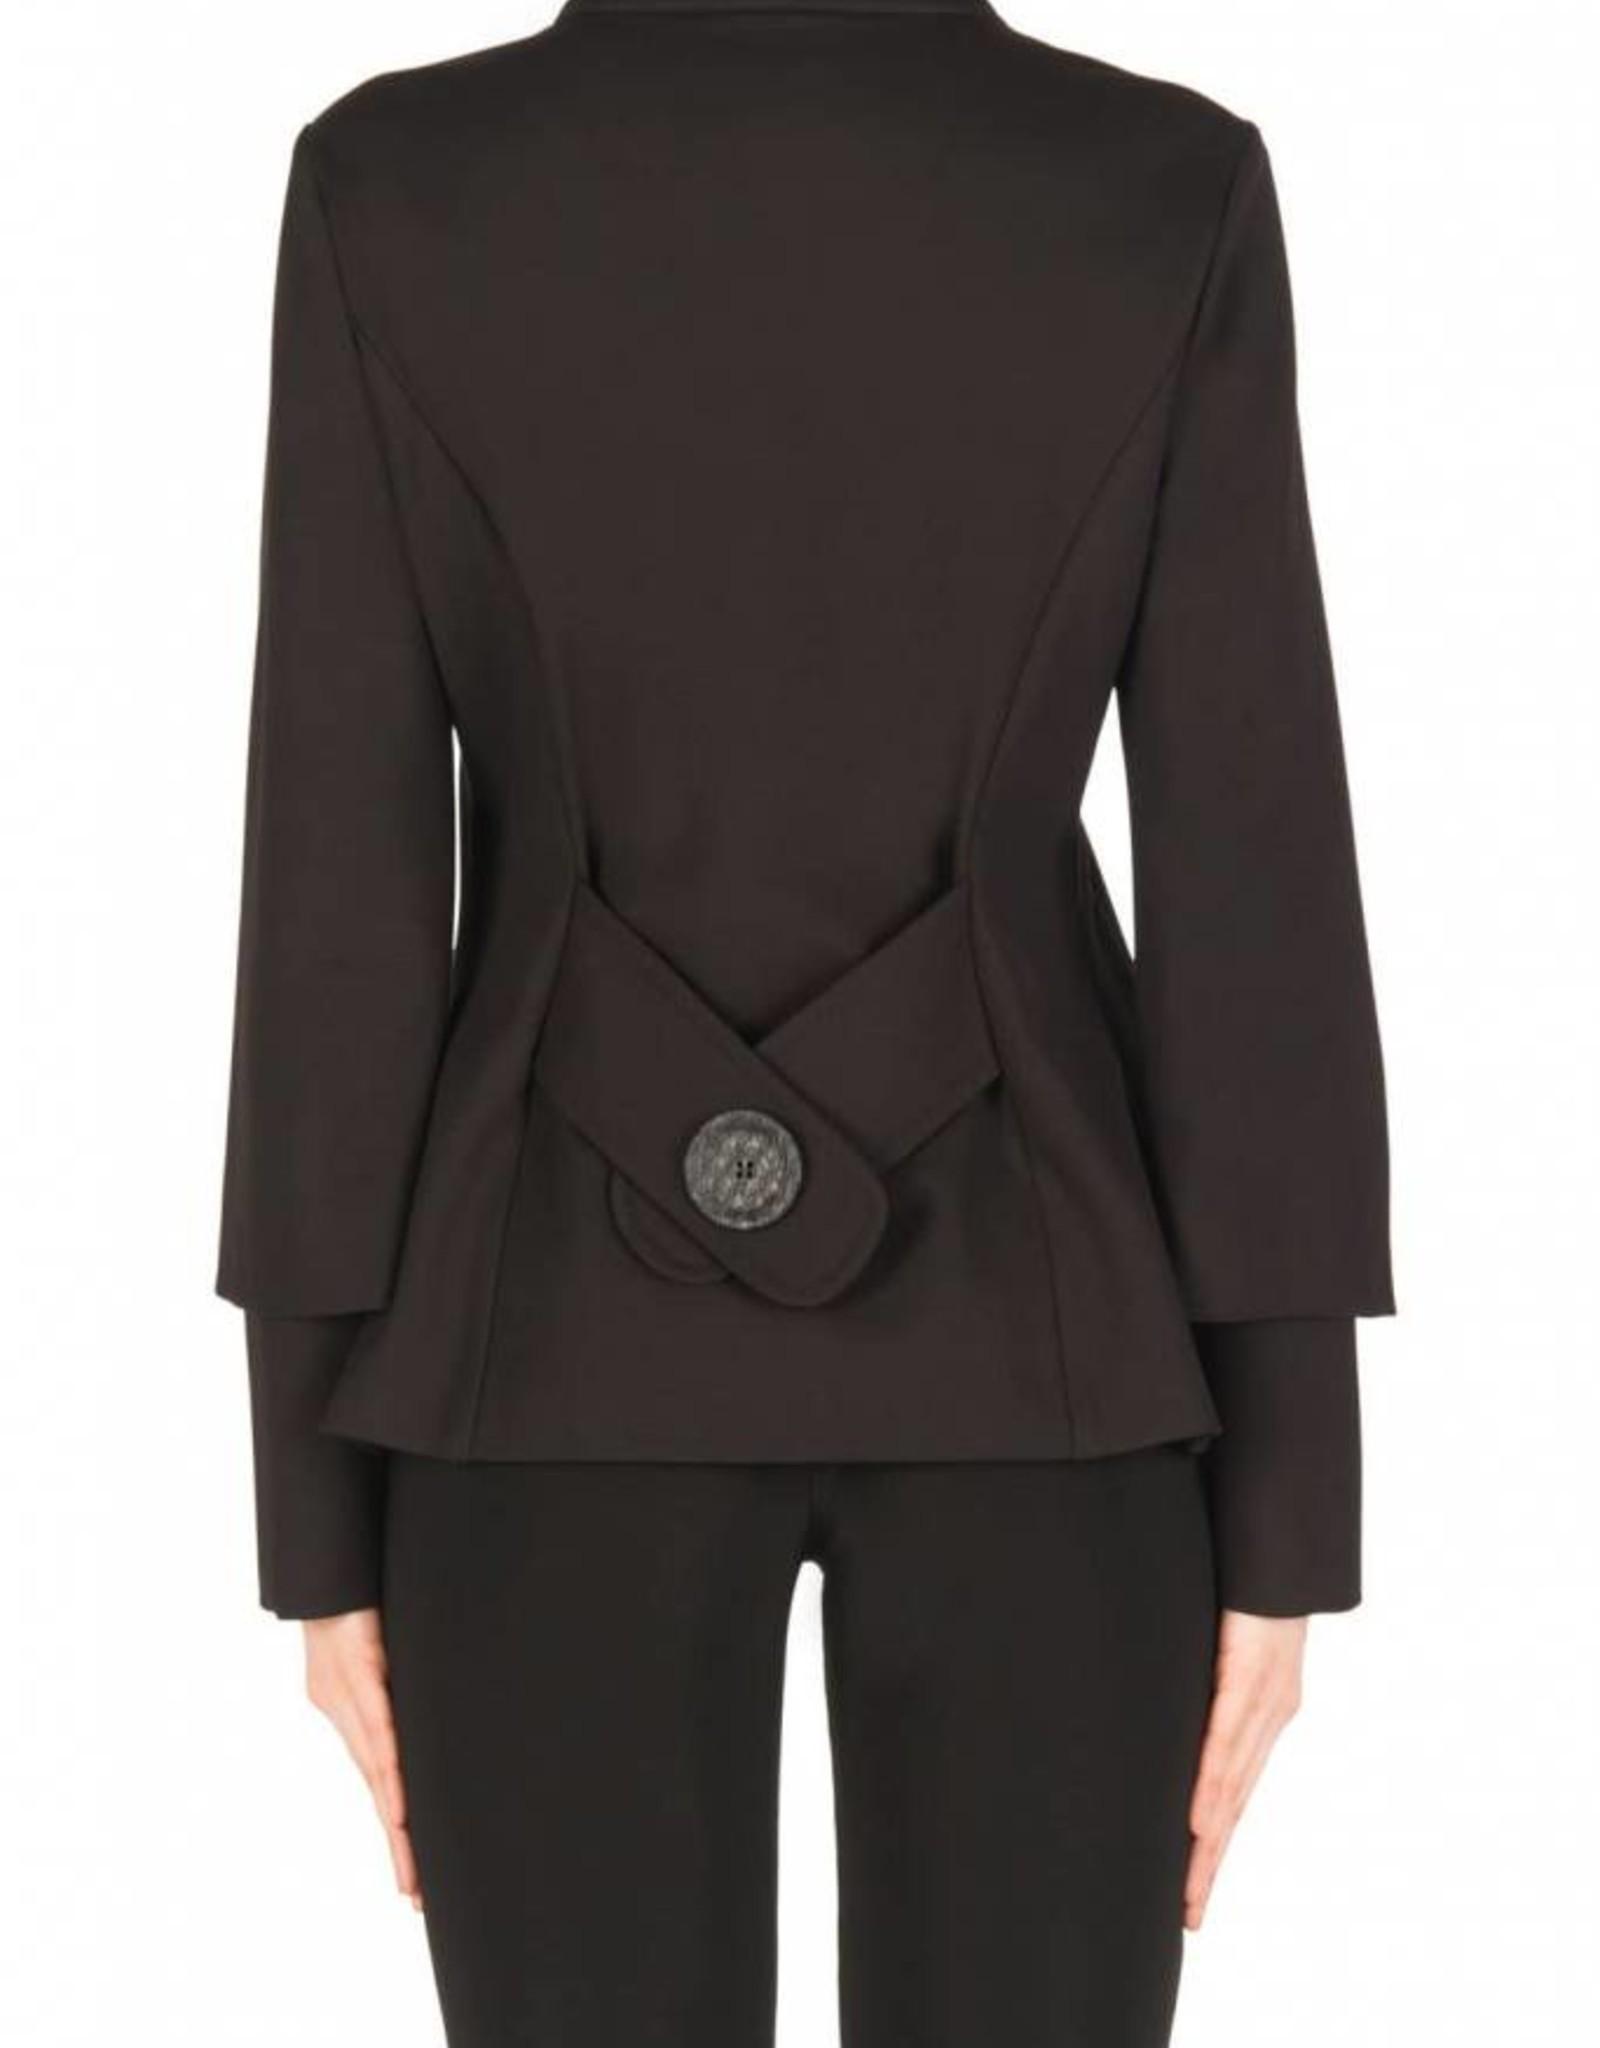 Joseph Ribkoff Joseph Ribkoff Charcoal/Black Jacket 183357